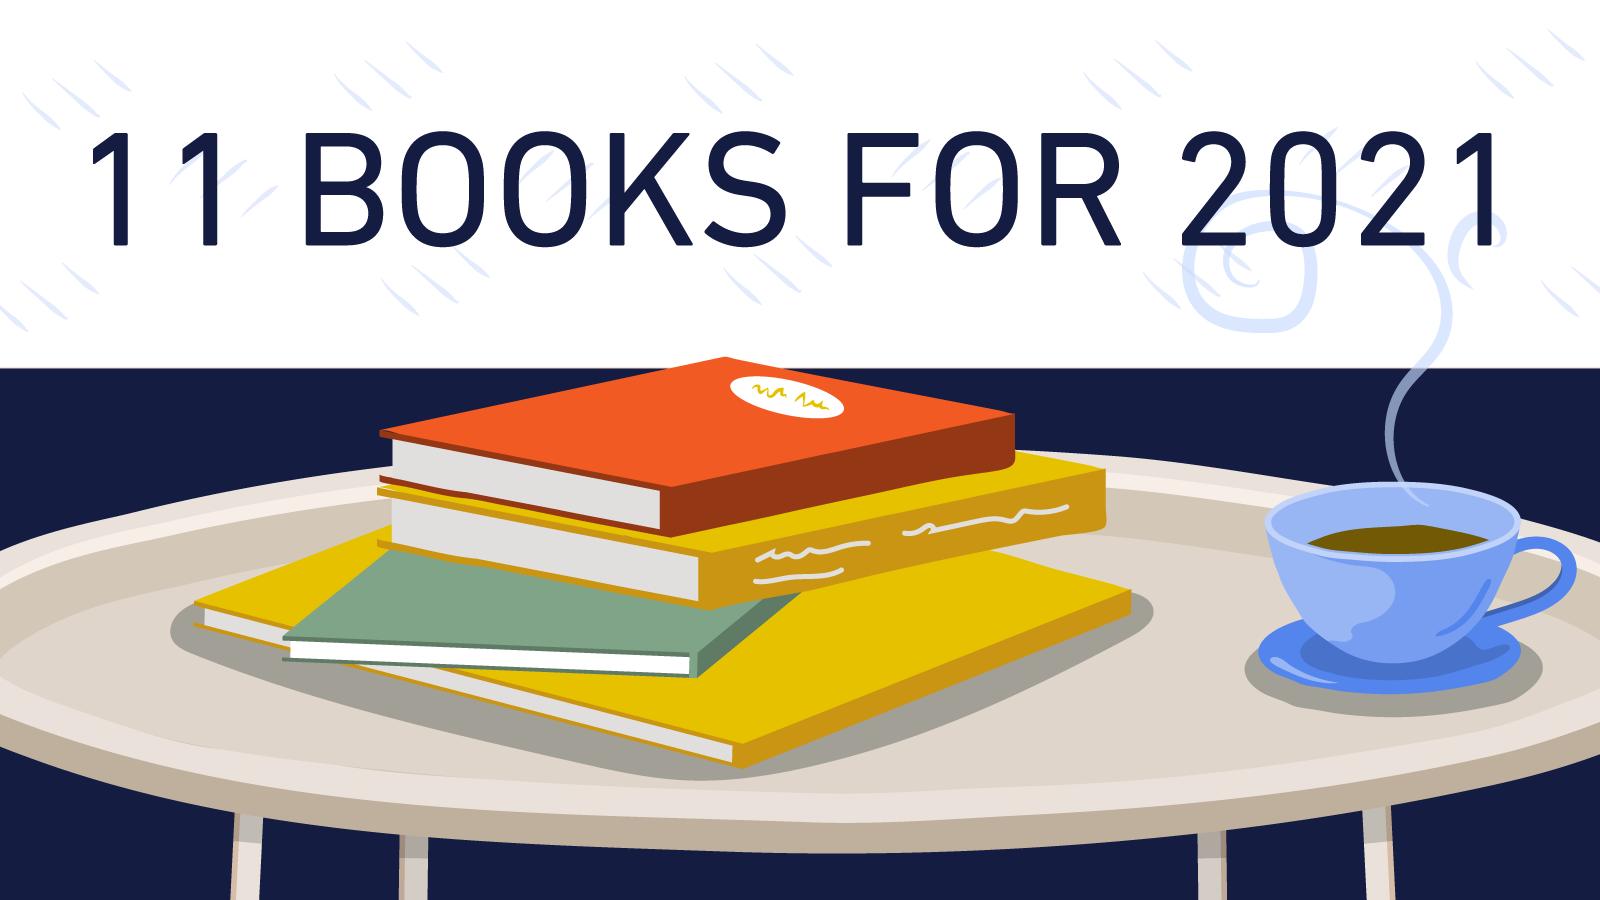 Central-App-books_1600x900